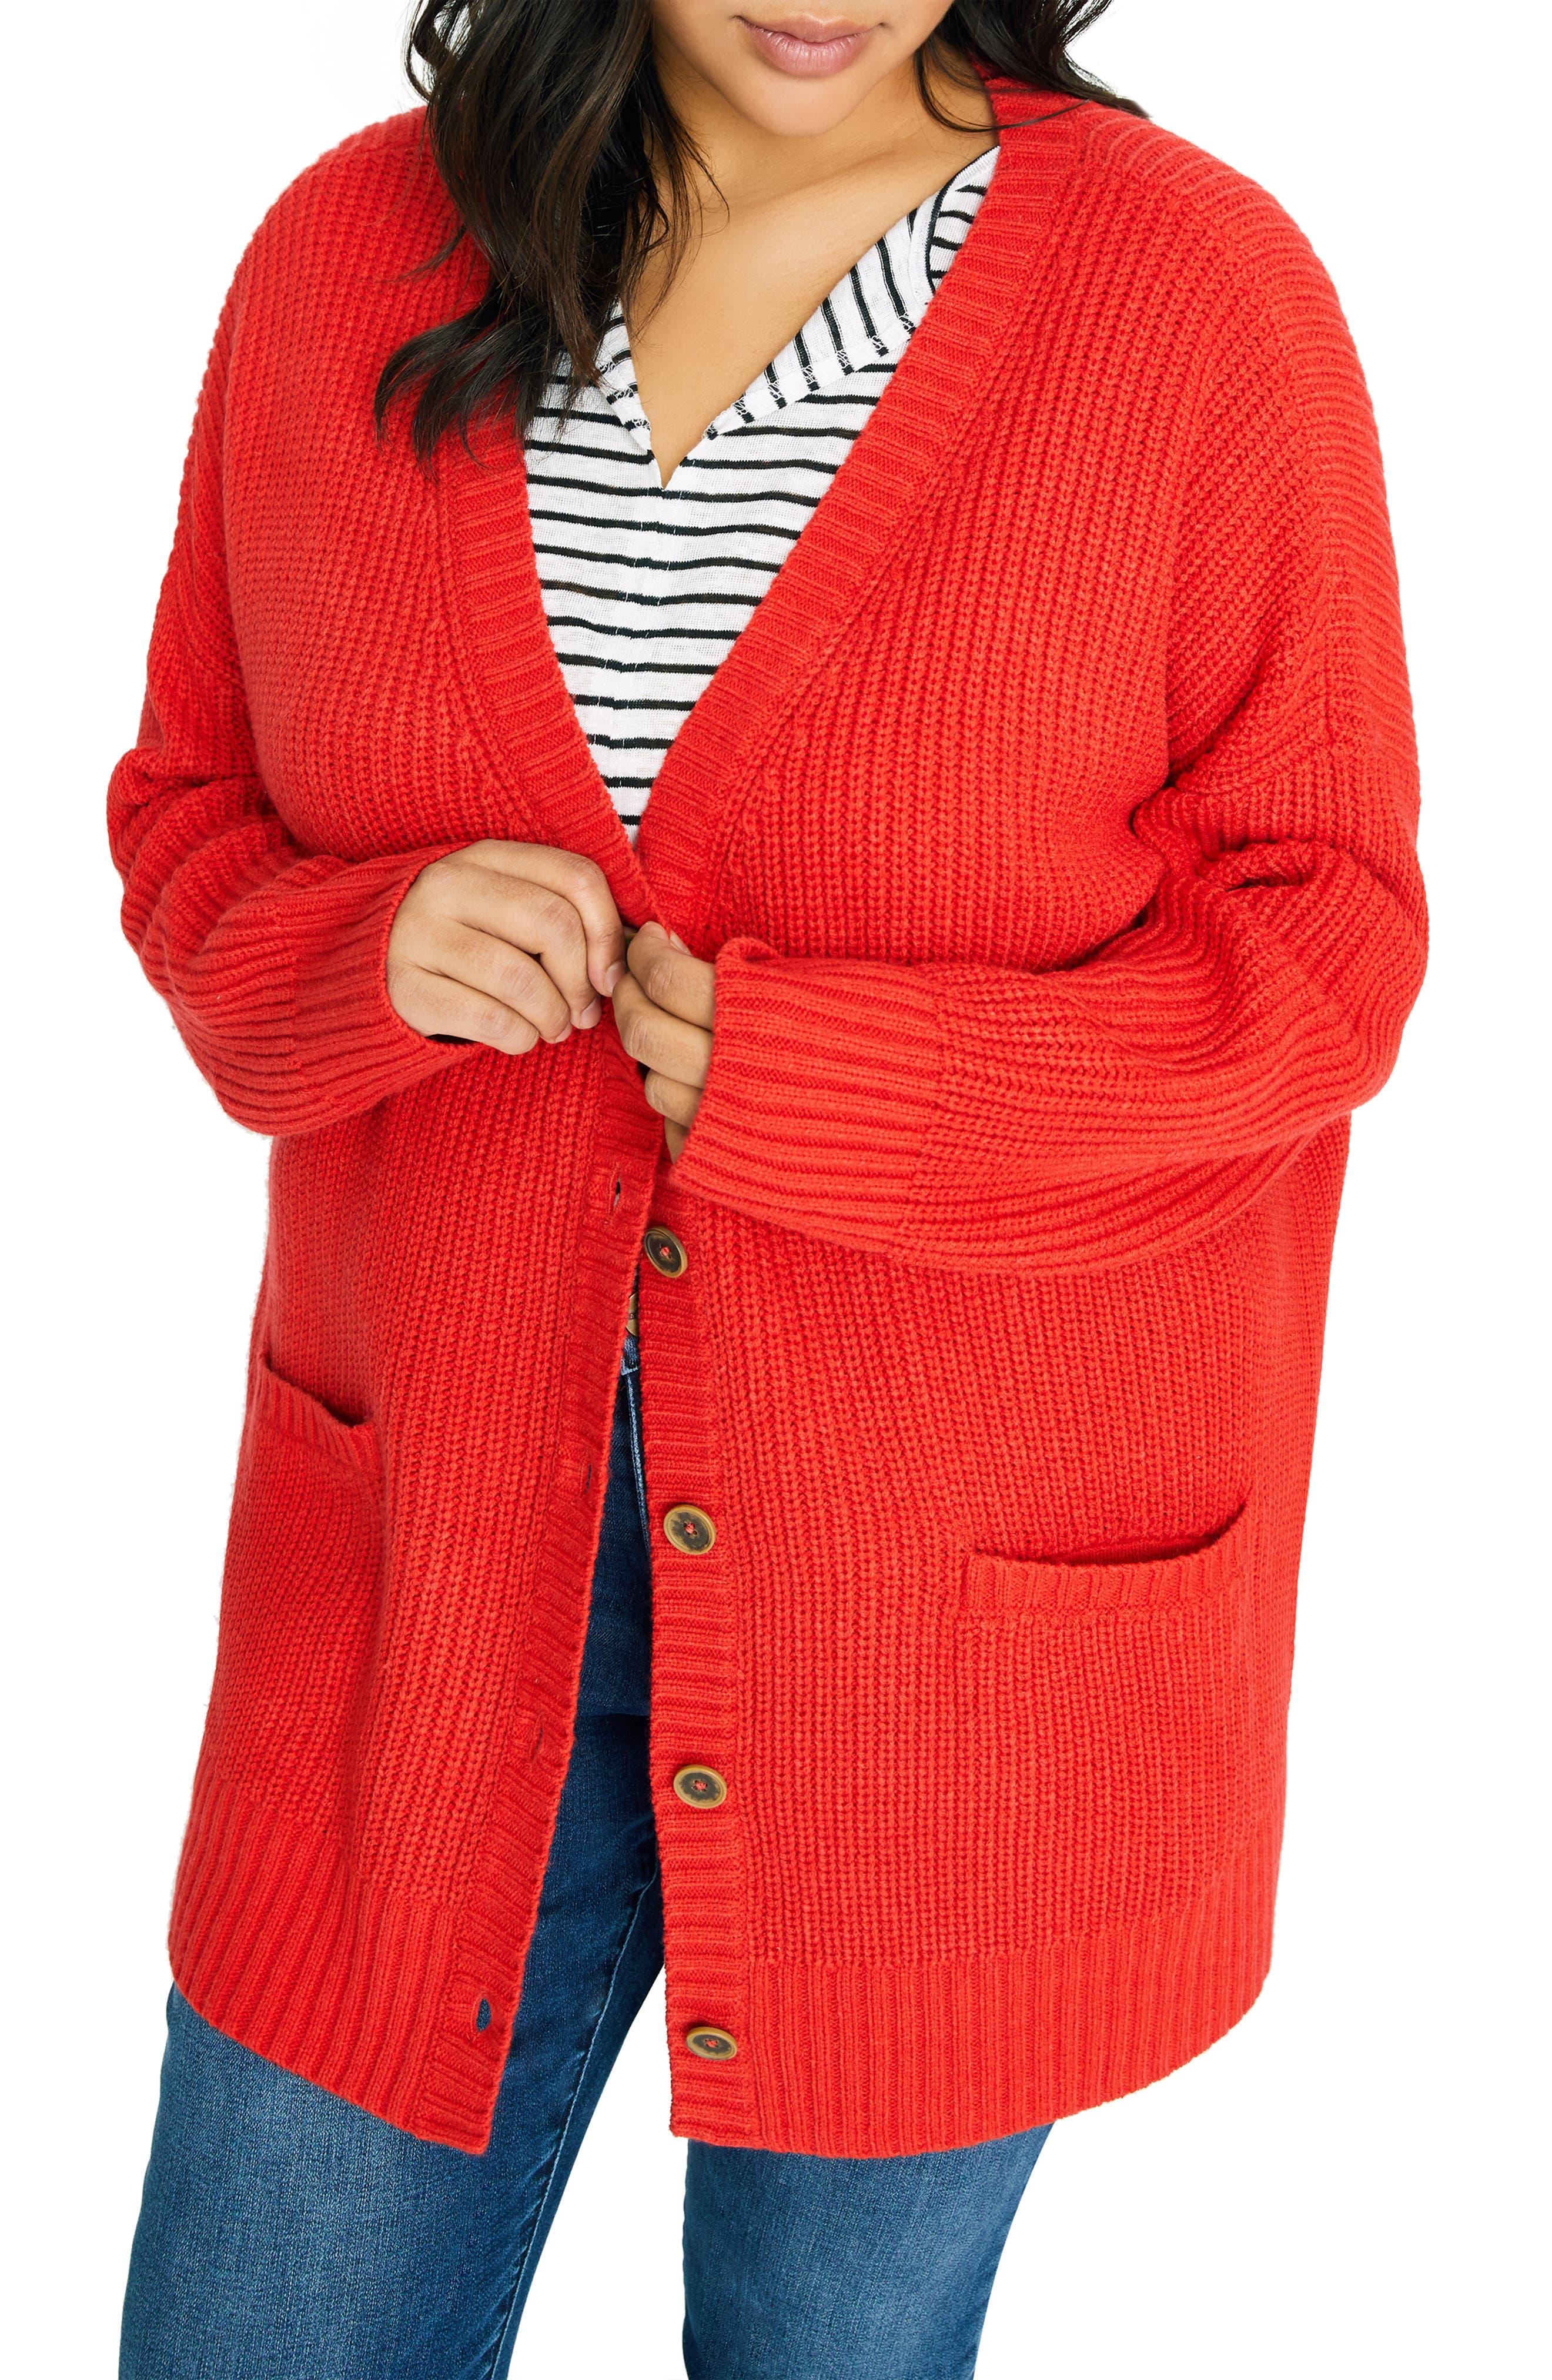 Plus Size Sanctuary Keep It Cozy Shaker Knit Cardigan, Red